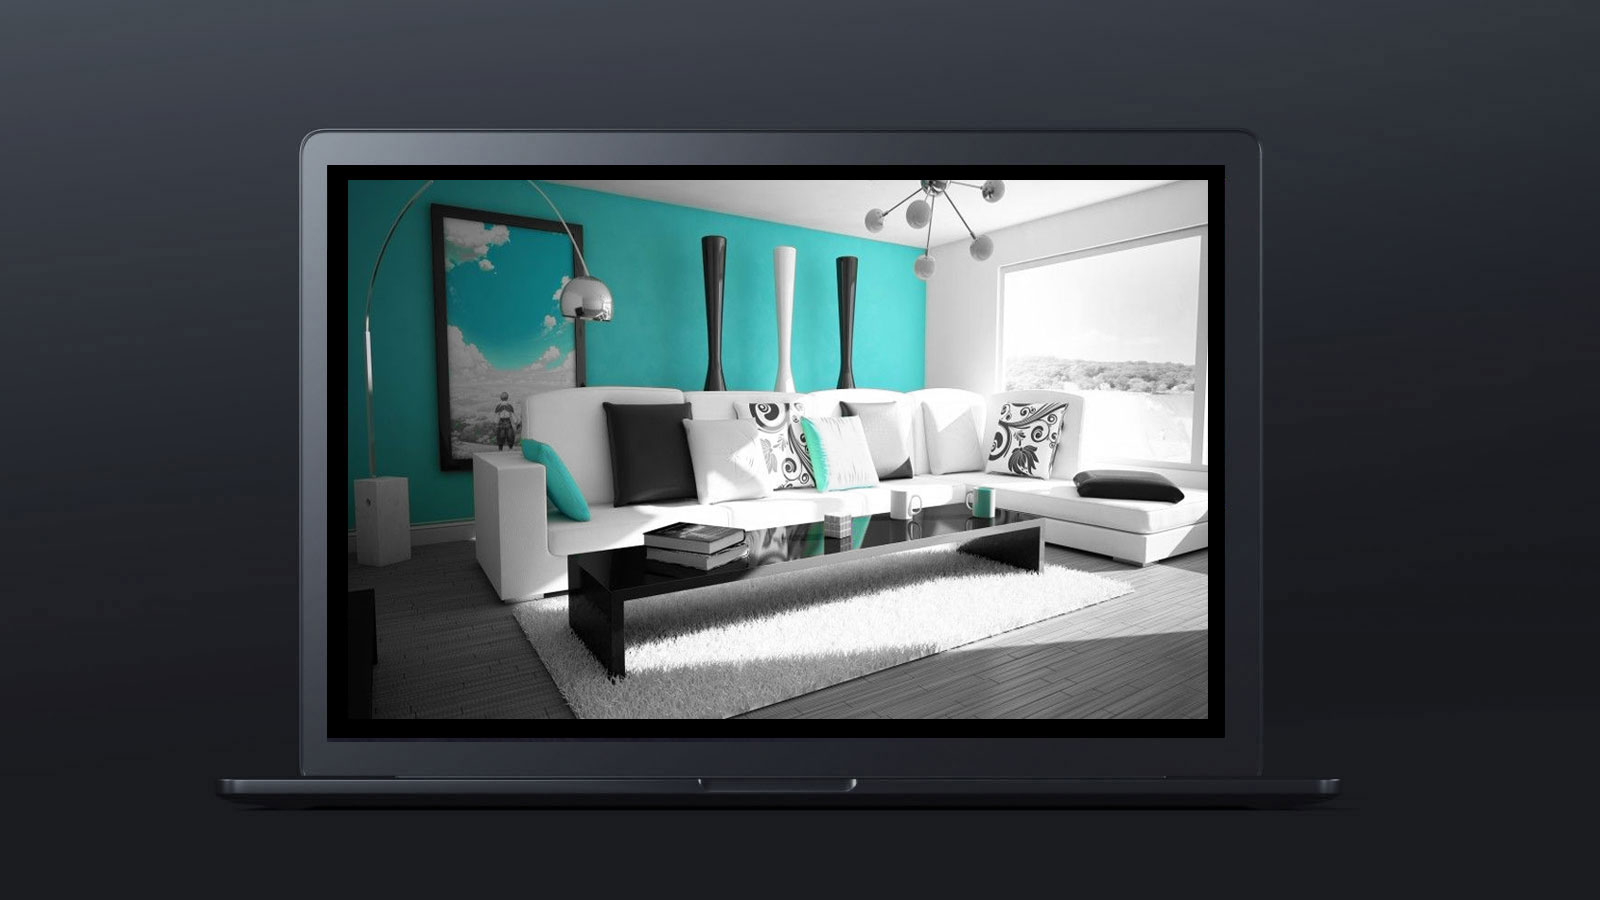 Design Color 3 - نقش رنگ و رنگ آمیزی در دکوراسیون داخلی